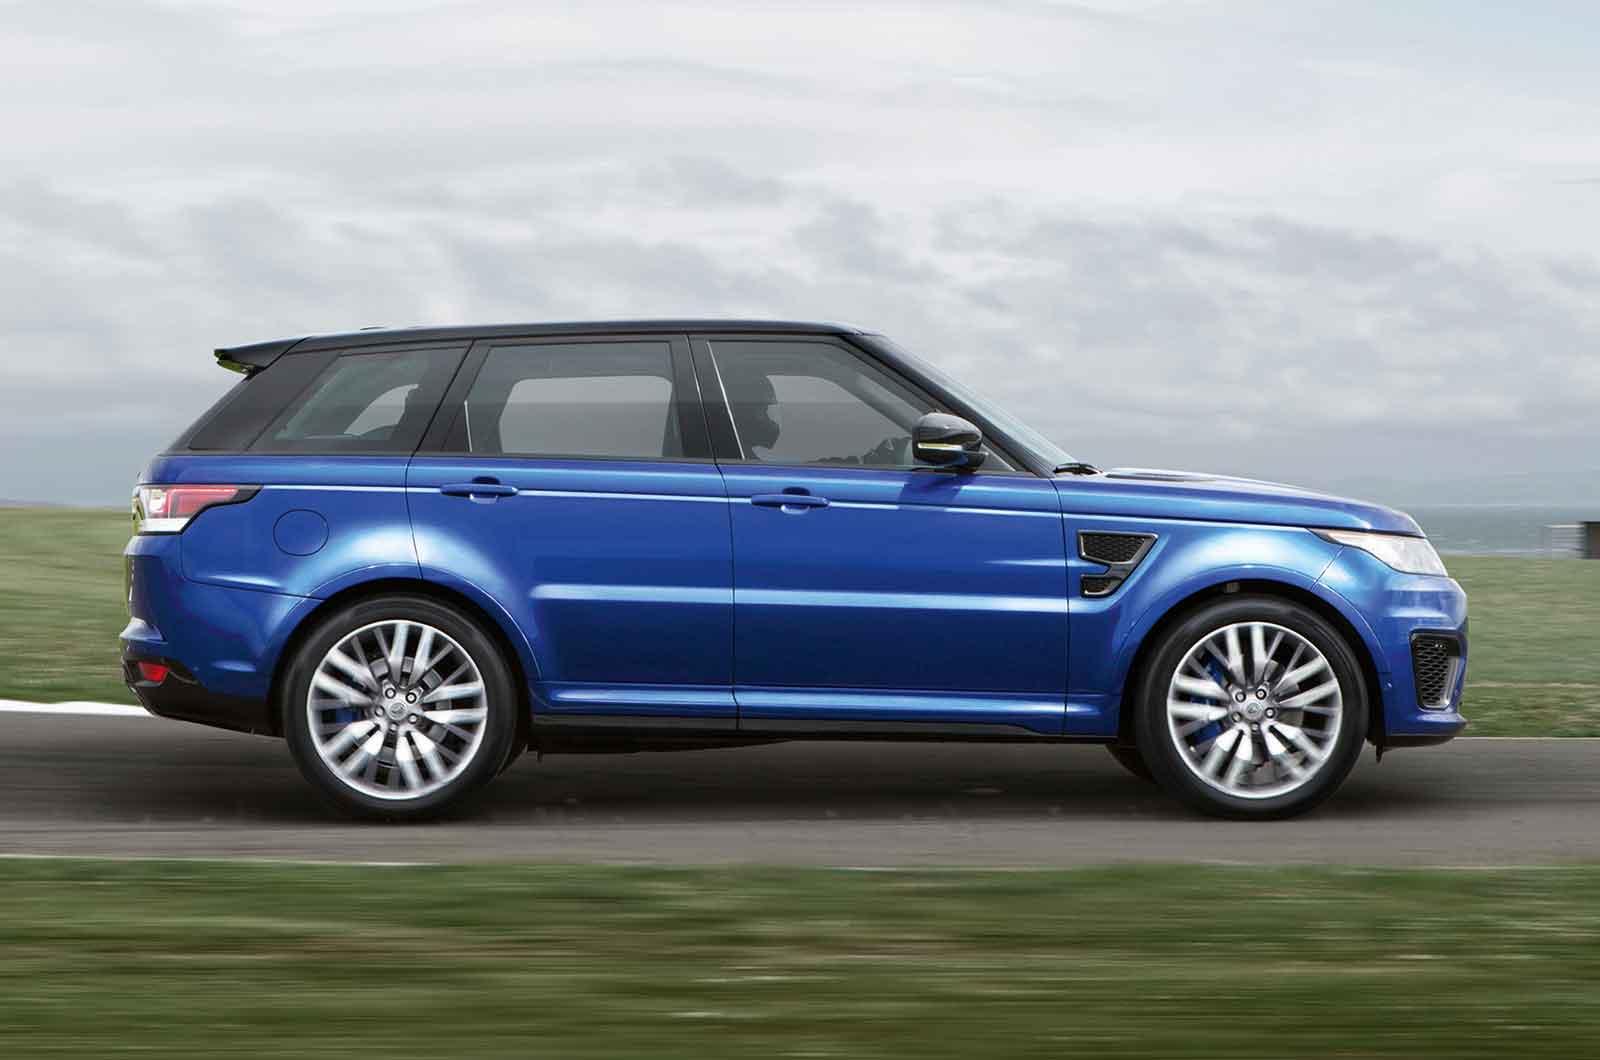 Range Rover New Model >> 2015 Range Rover Sport SVR revealed - photos | CarAdvice